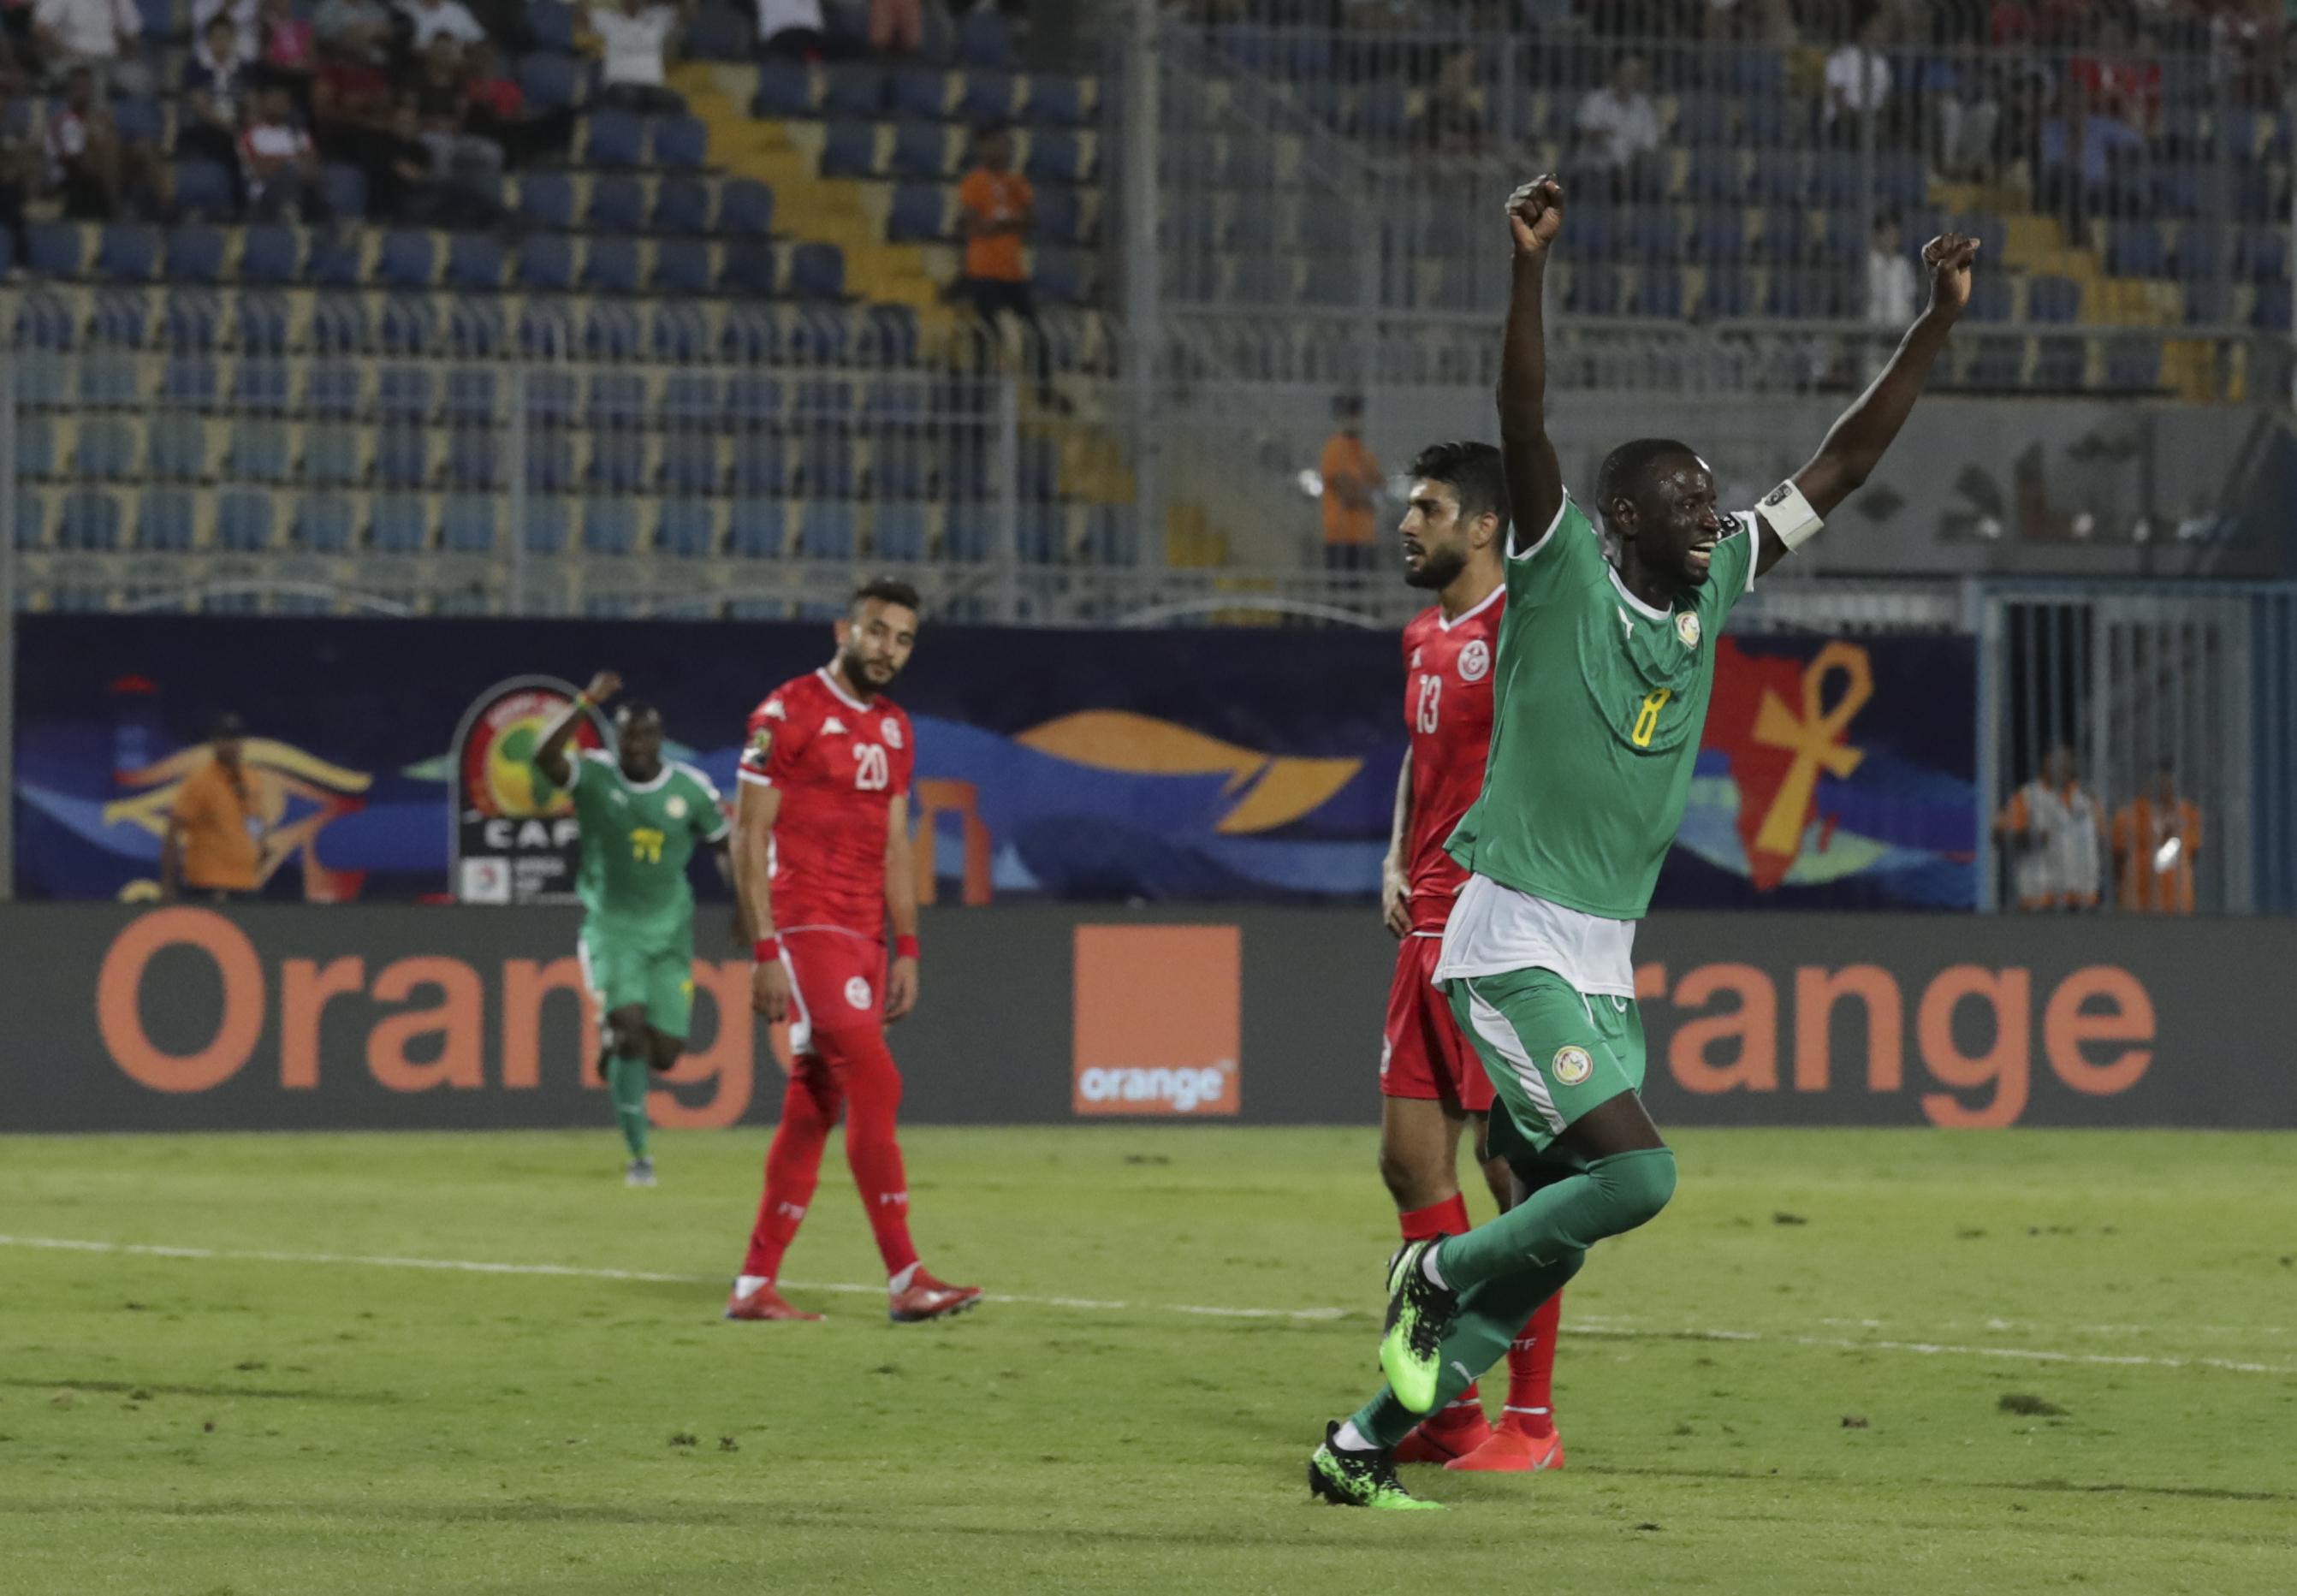 Senegal vs. Algeria, Mane vs. Mahrez in African Cup final